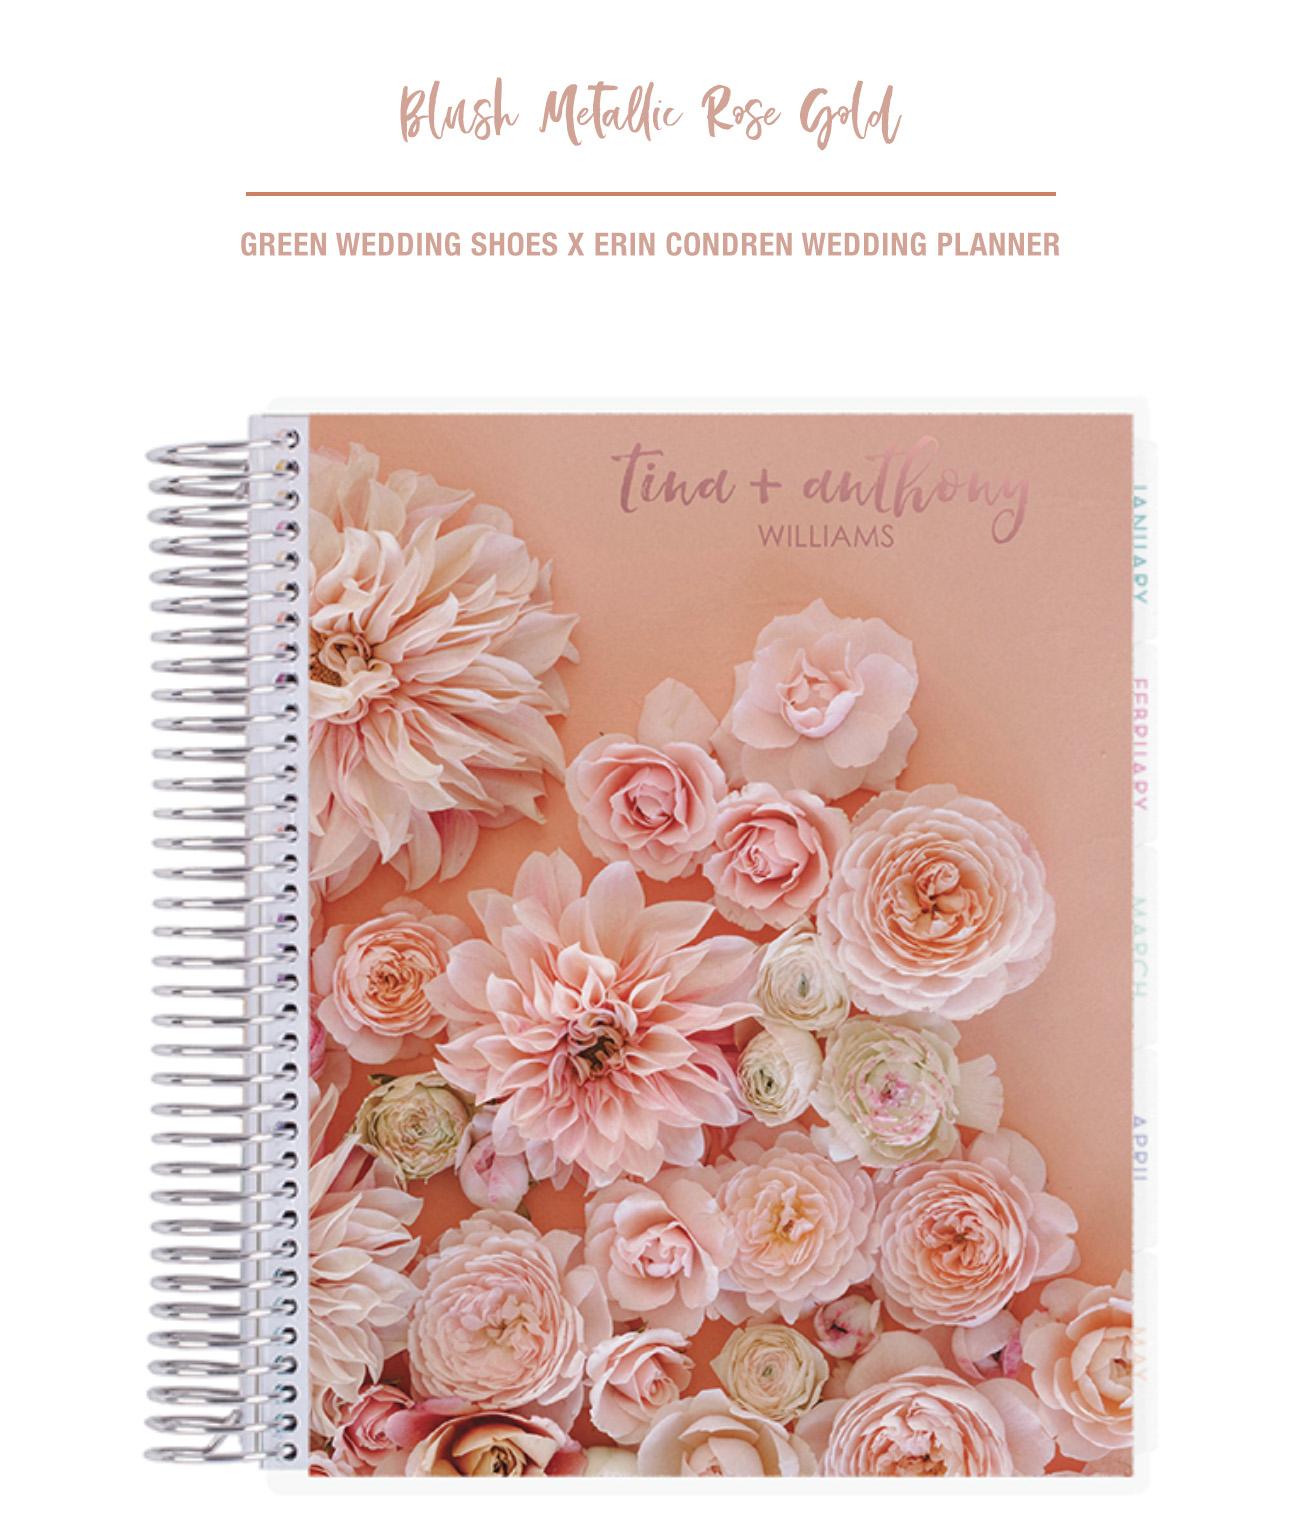 Green Wedding Shoes x Erin Condren Wedding Planner Blush Rose Gold Cover